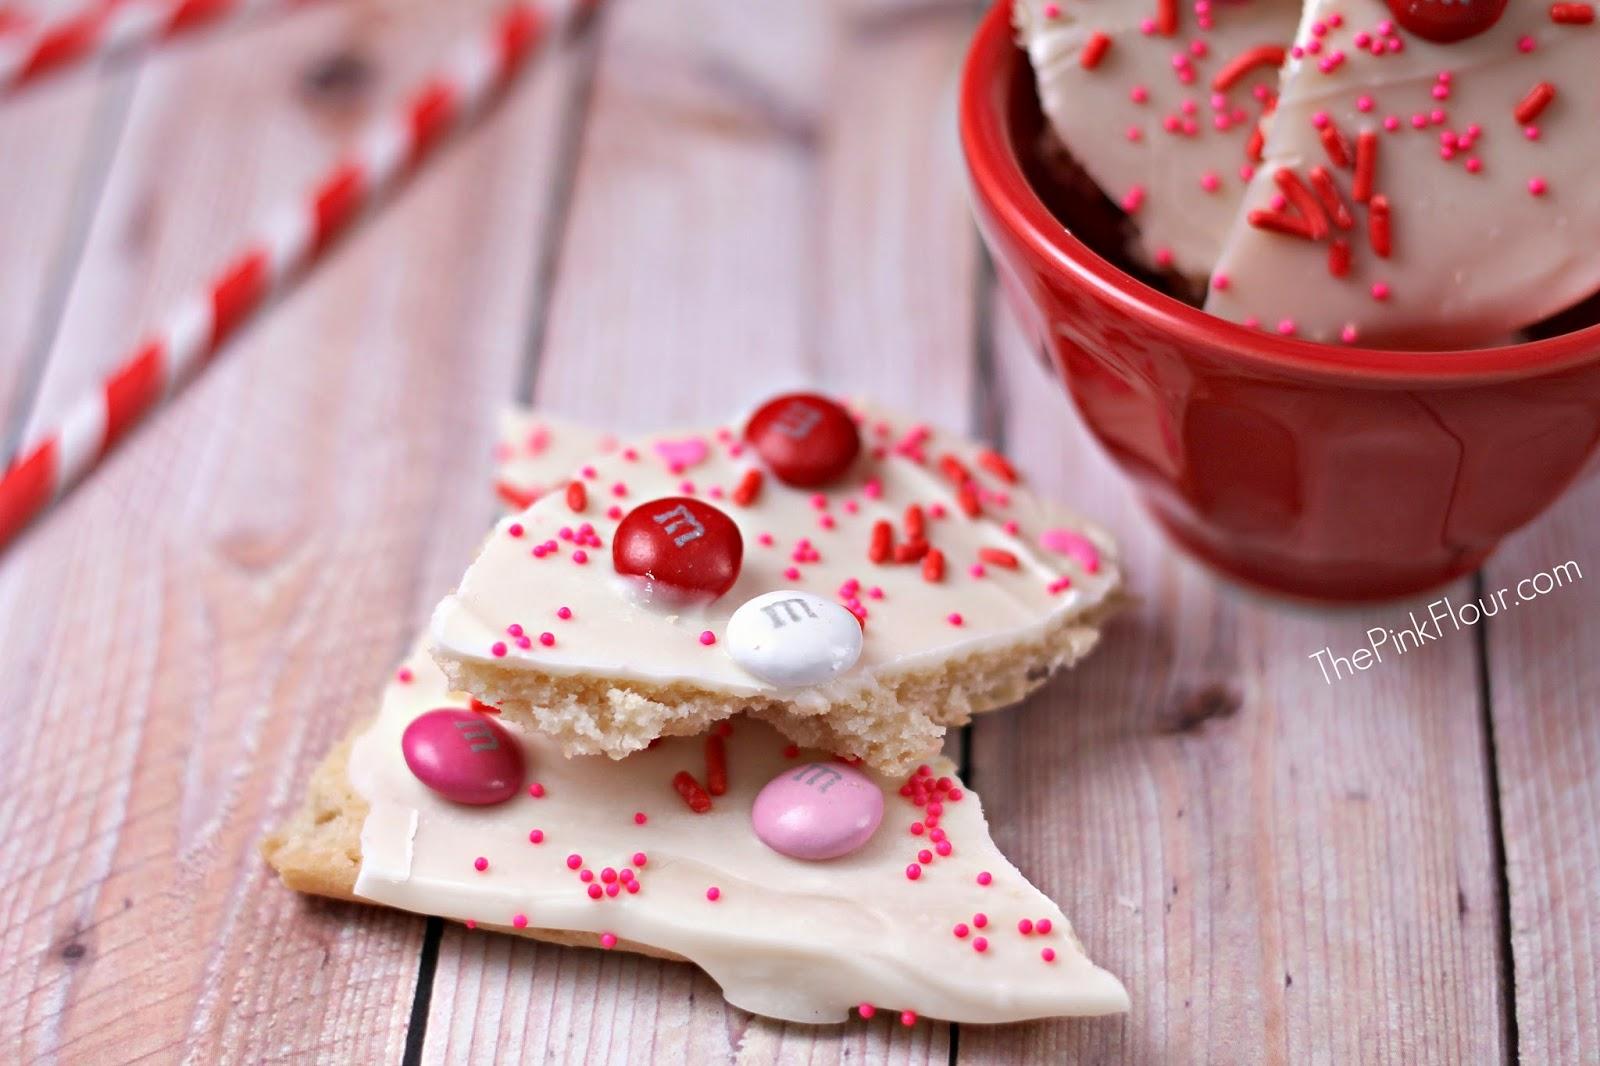 Valentine's Day White Chocolate Sugar Cookie Bark from www.thepinkflour.com #pillsbury #chocolate #valentines